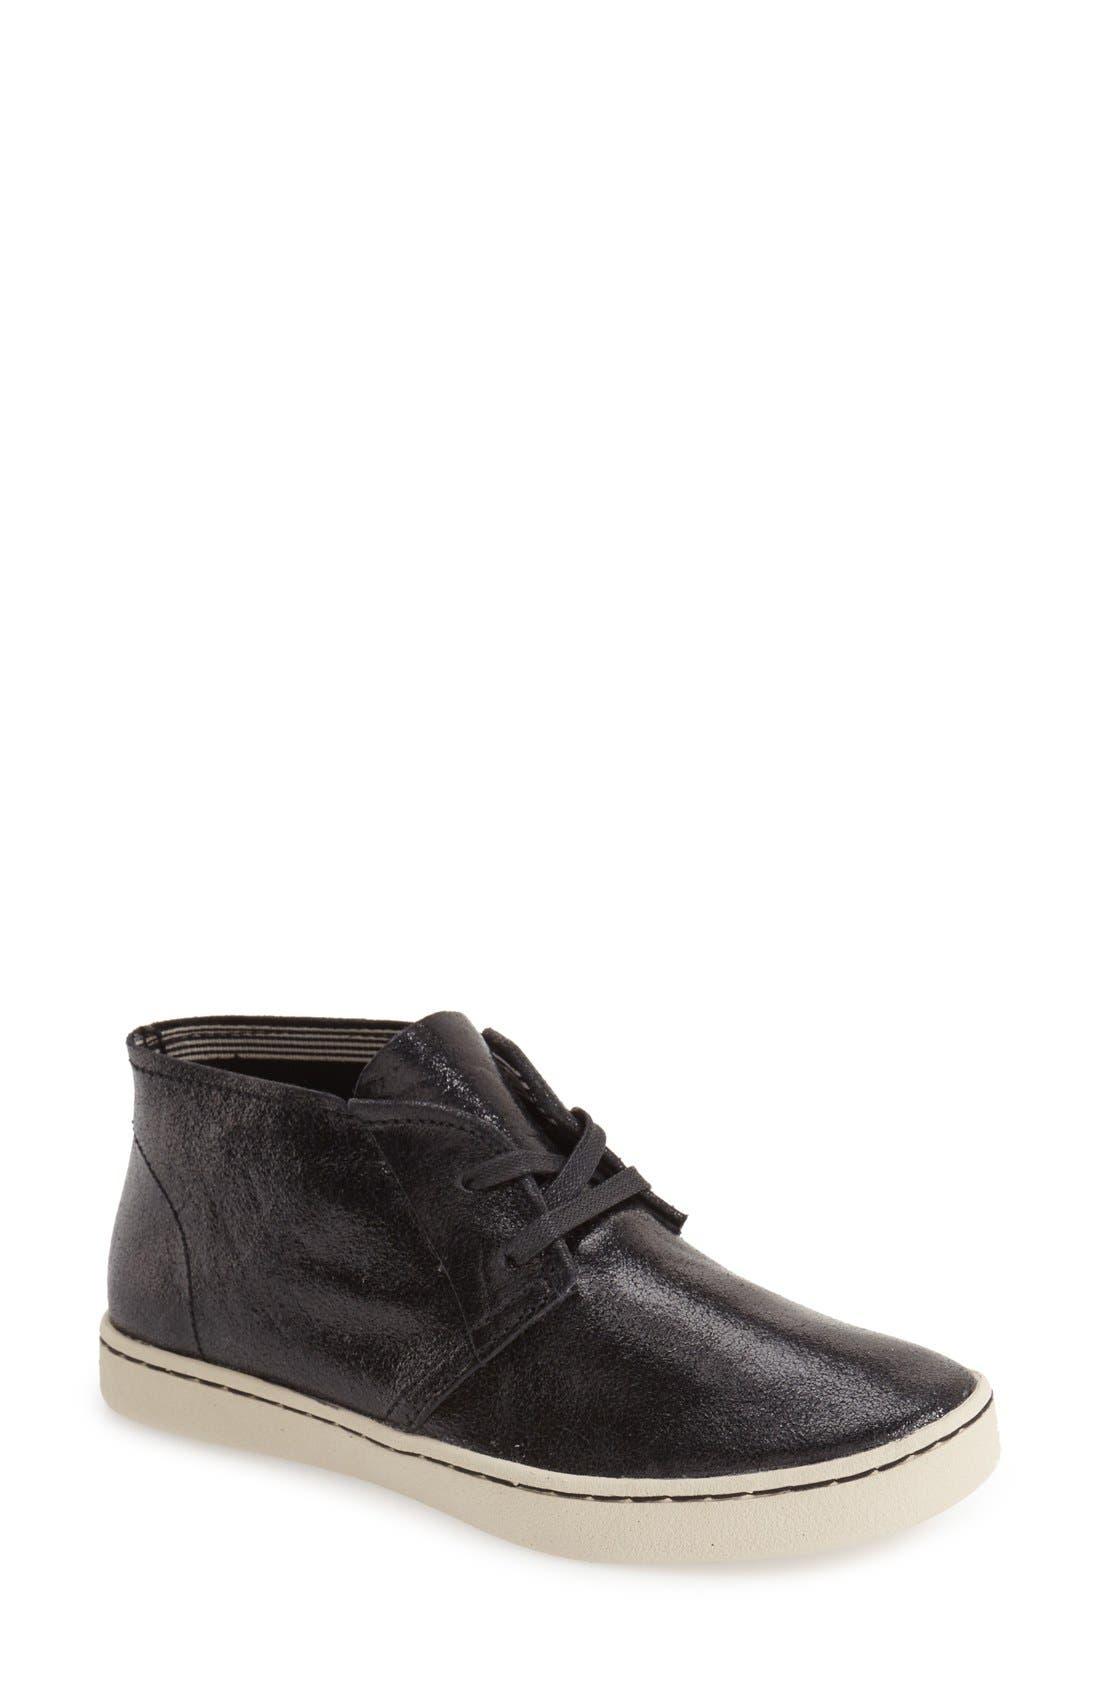 'Cille Gwen' Sneaker,                             Main thumbnail 3, color,